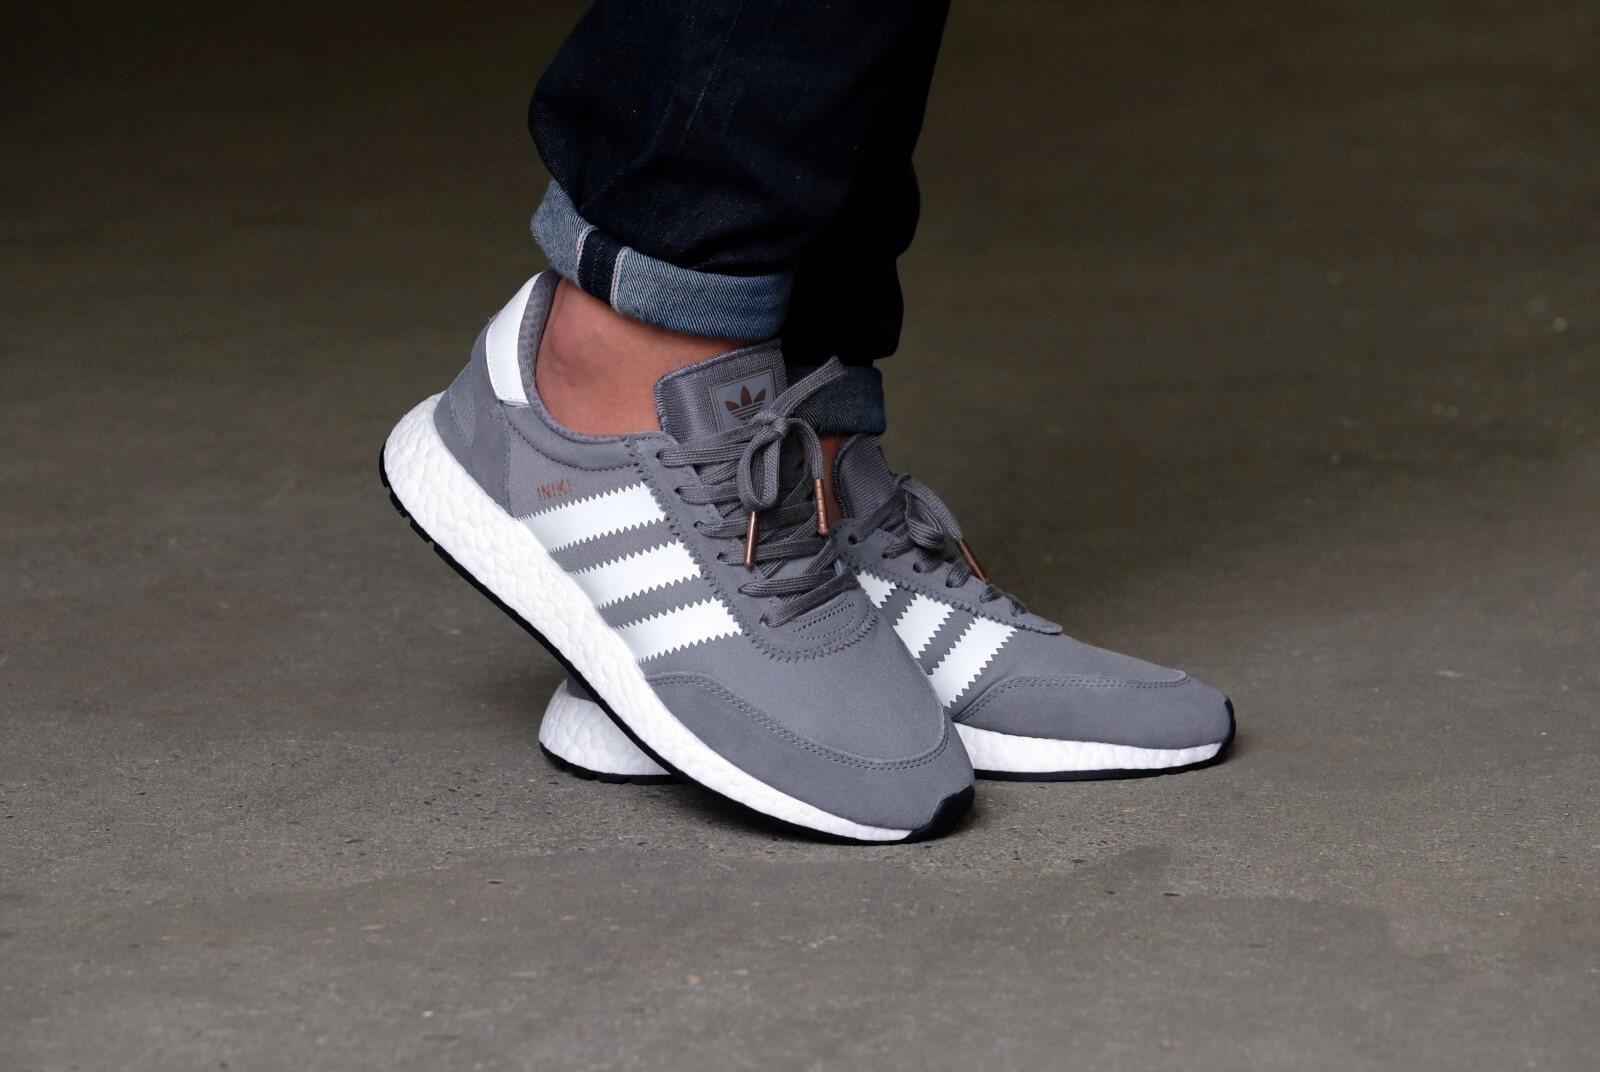 https://static.sneakerdistrict.com/images2/DSCF0220-1600.jpg